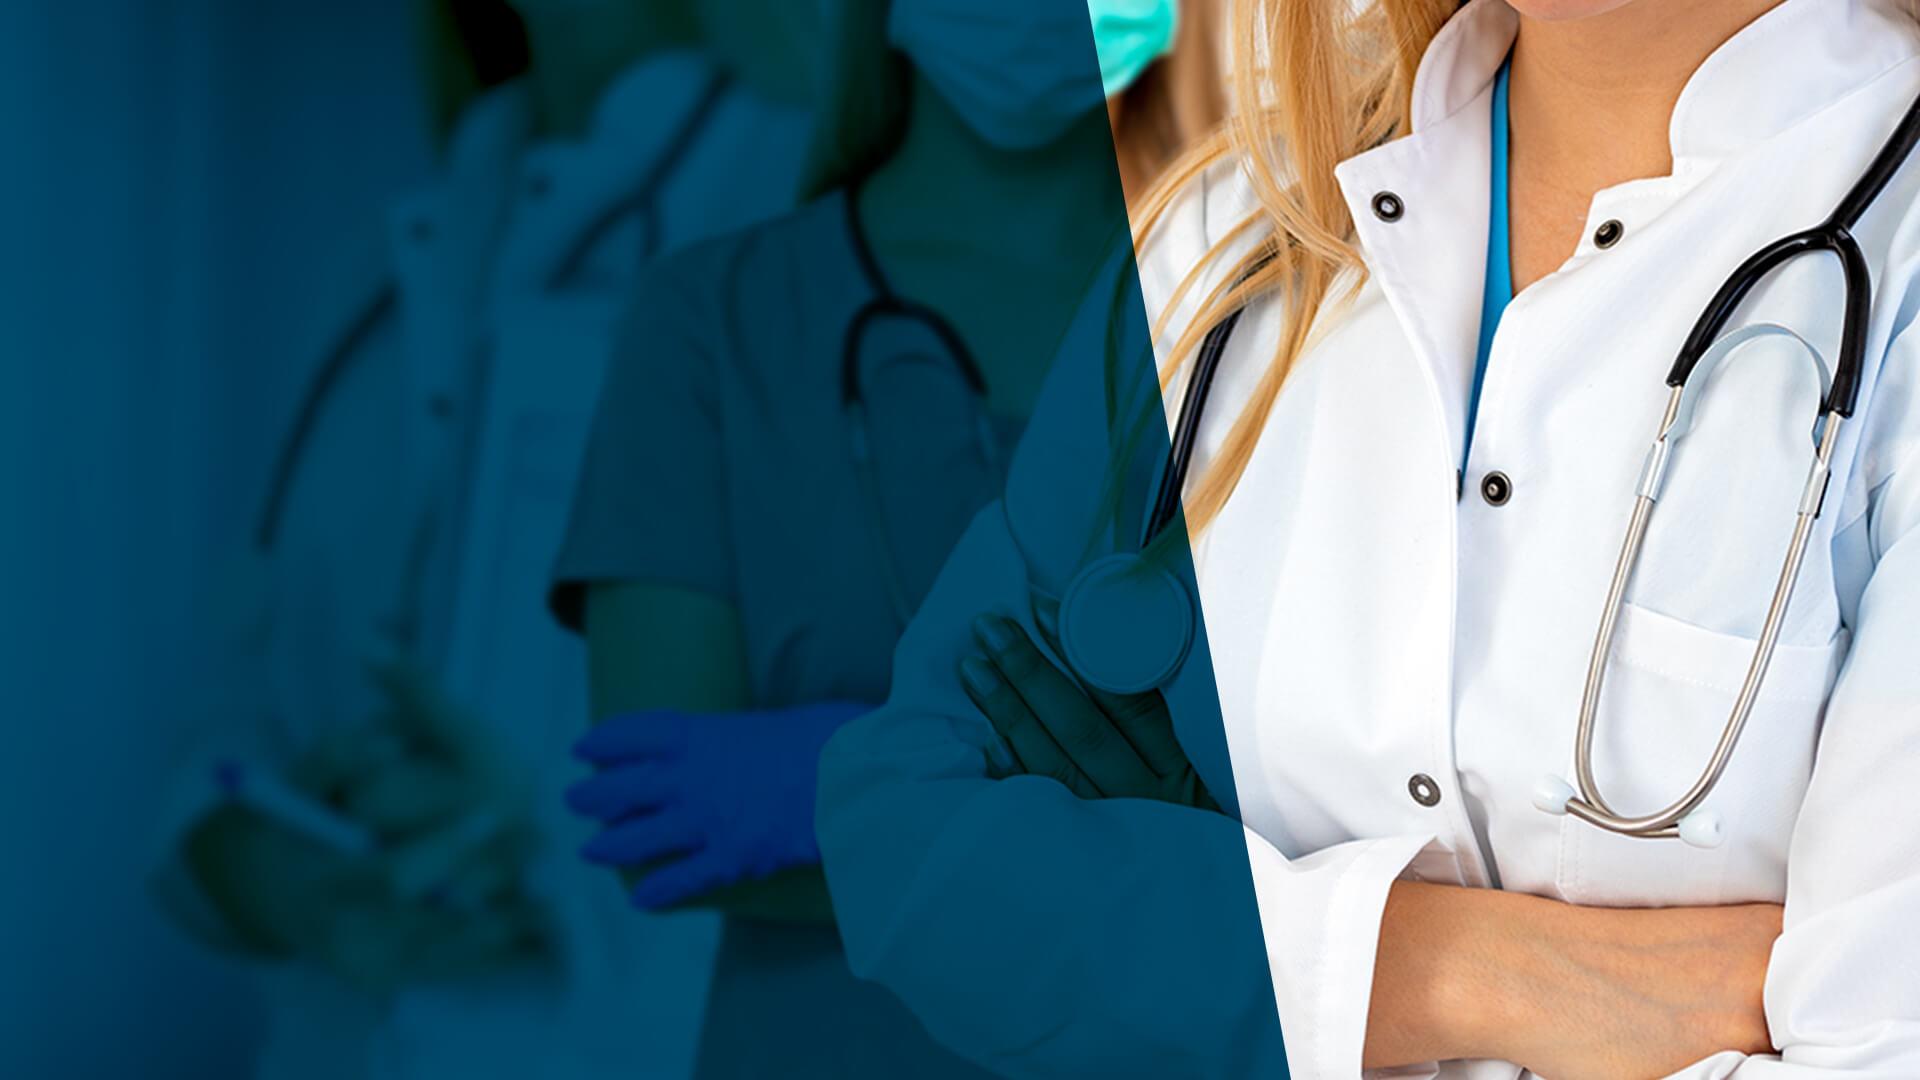 Medizin & Gesundheitswesen persoperm